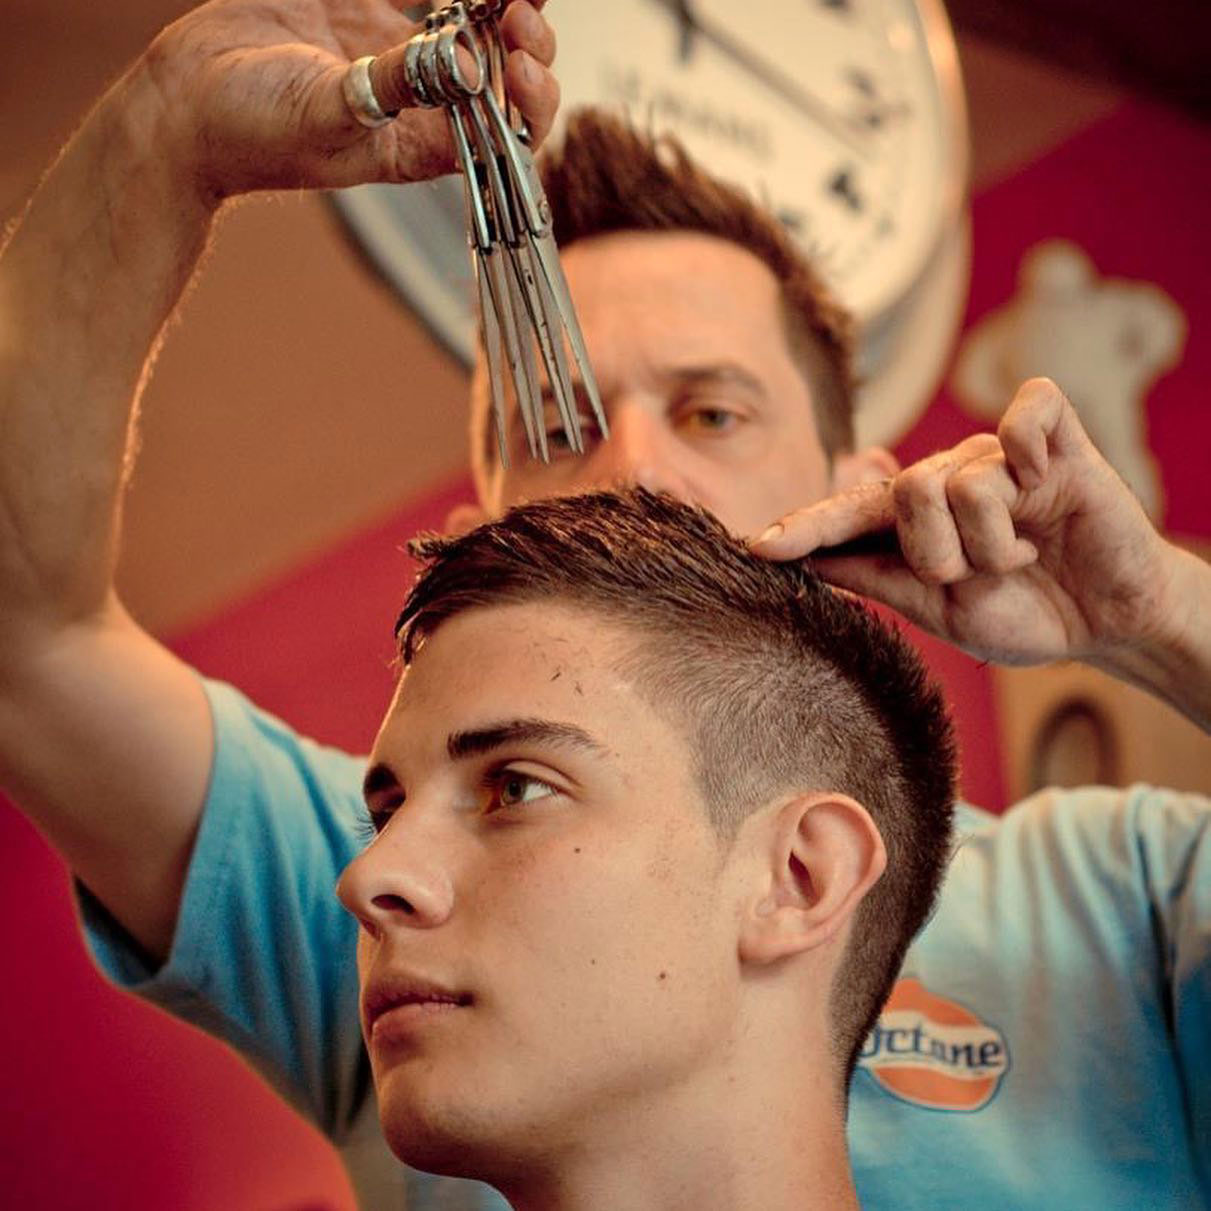 octane-hairdressers-barbers-hawkhurst-kent-13